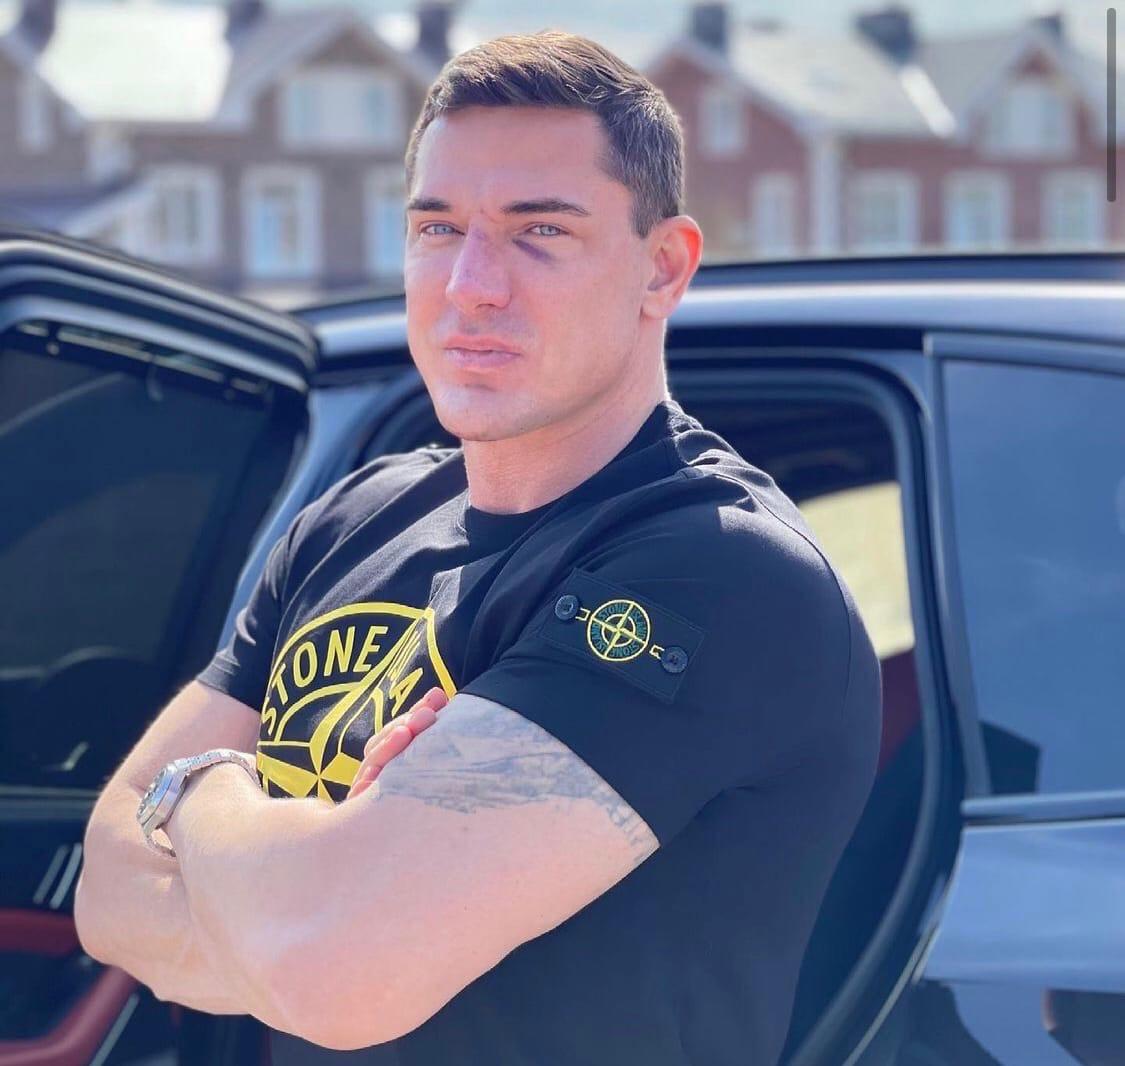 Kurban Omarov boasted that he beat three hooligans